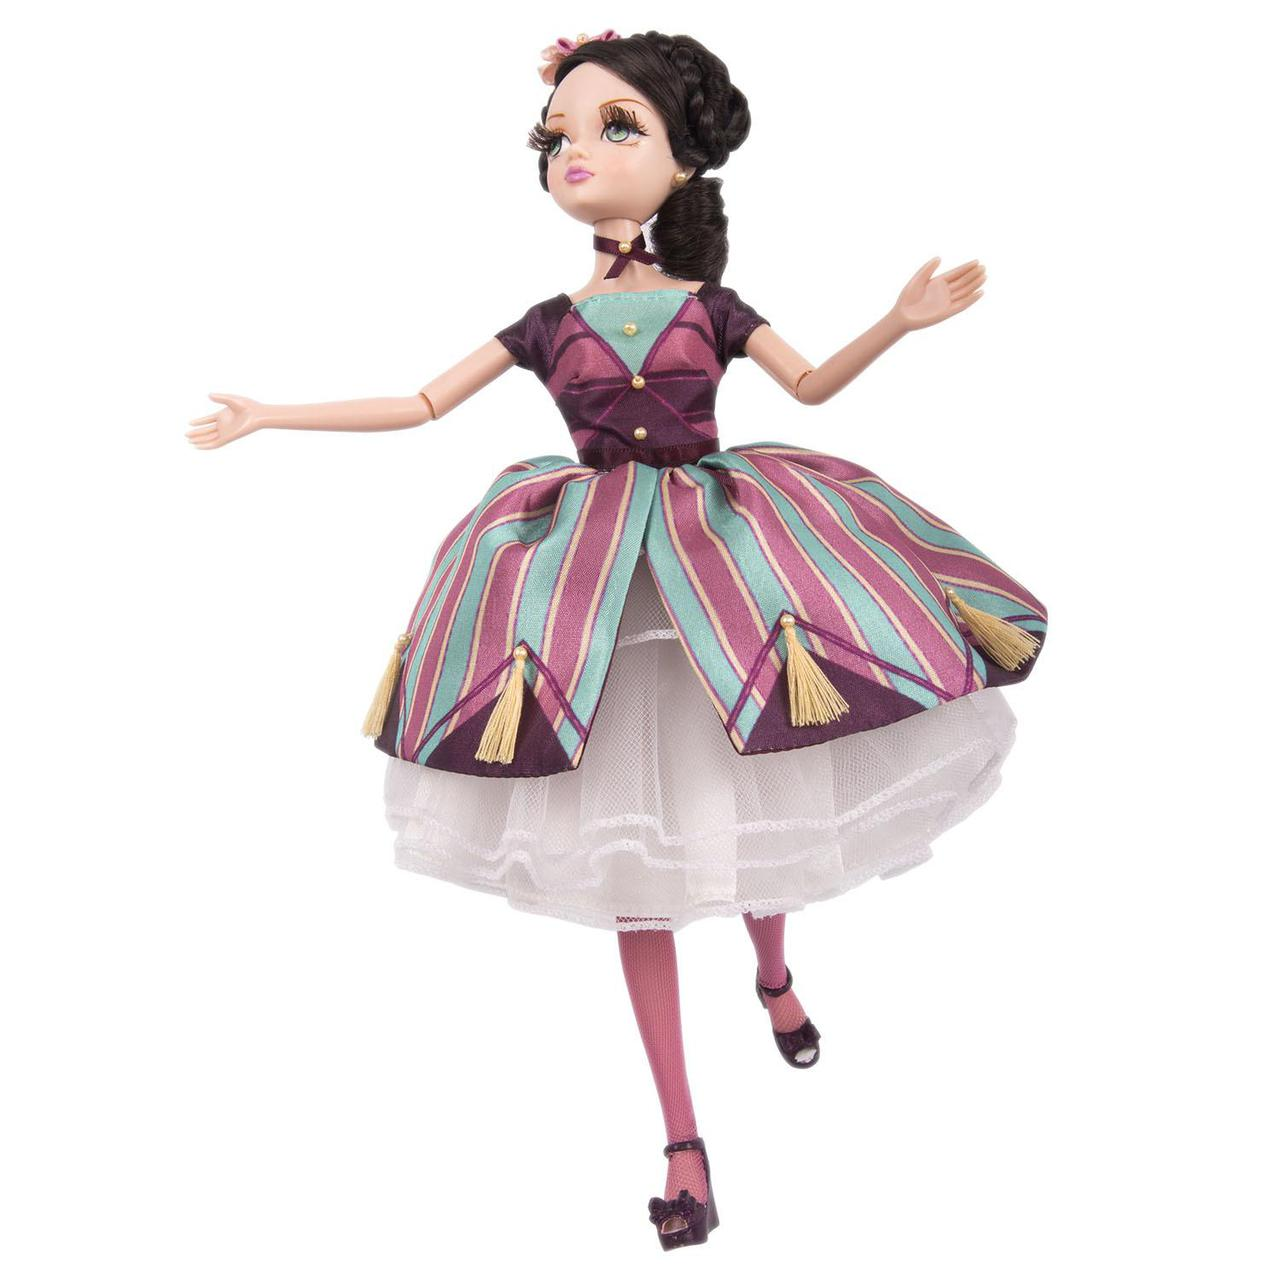 "Кукла Sonya Rose, серия ""Gold collection"" платье Алиса (Gulliver, Россия) - фото 2"